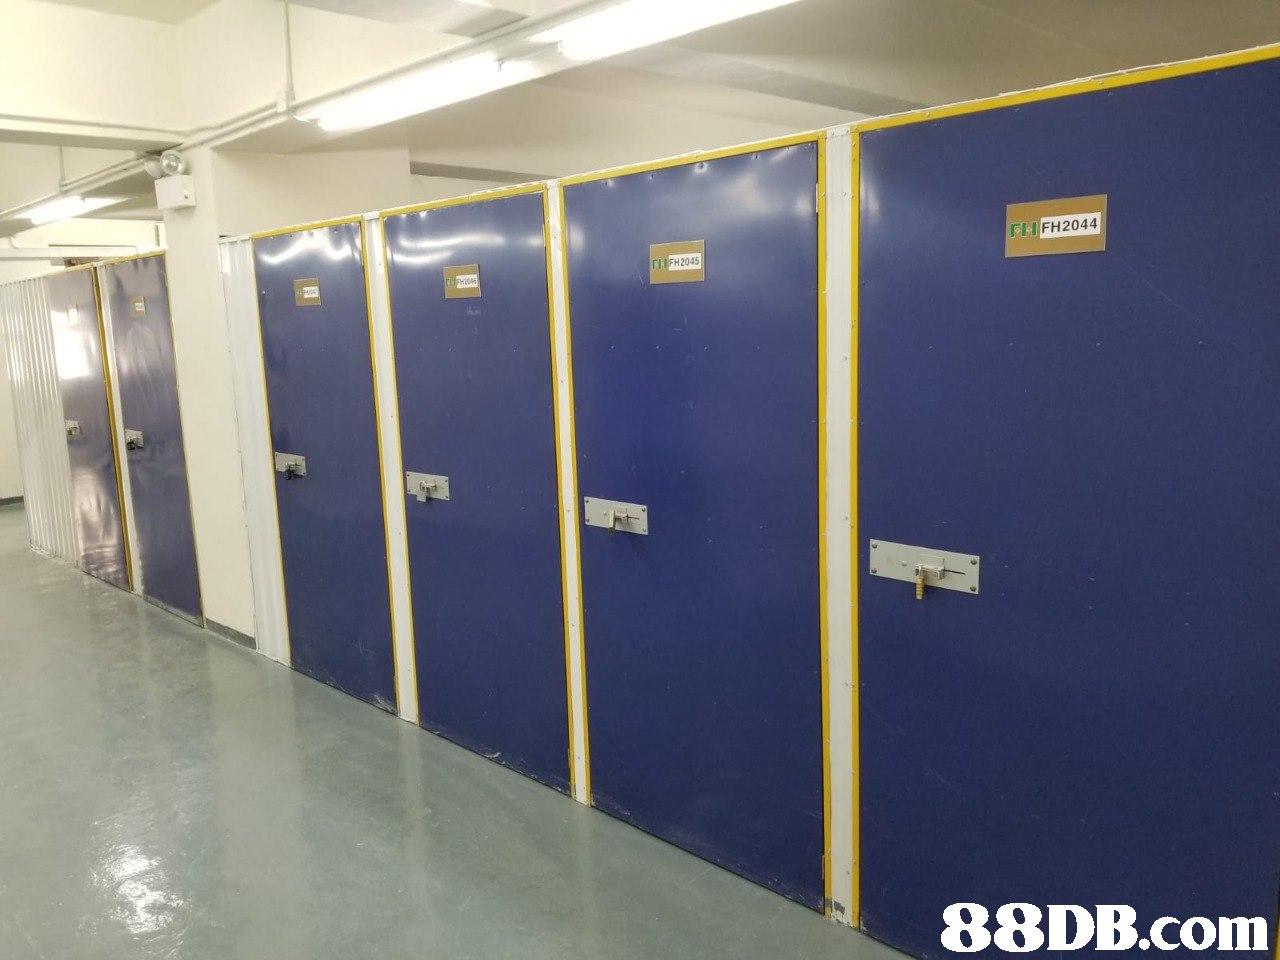 FH2044 FH2045   locker,glass,floor,product,